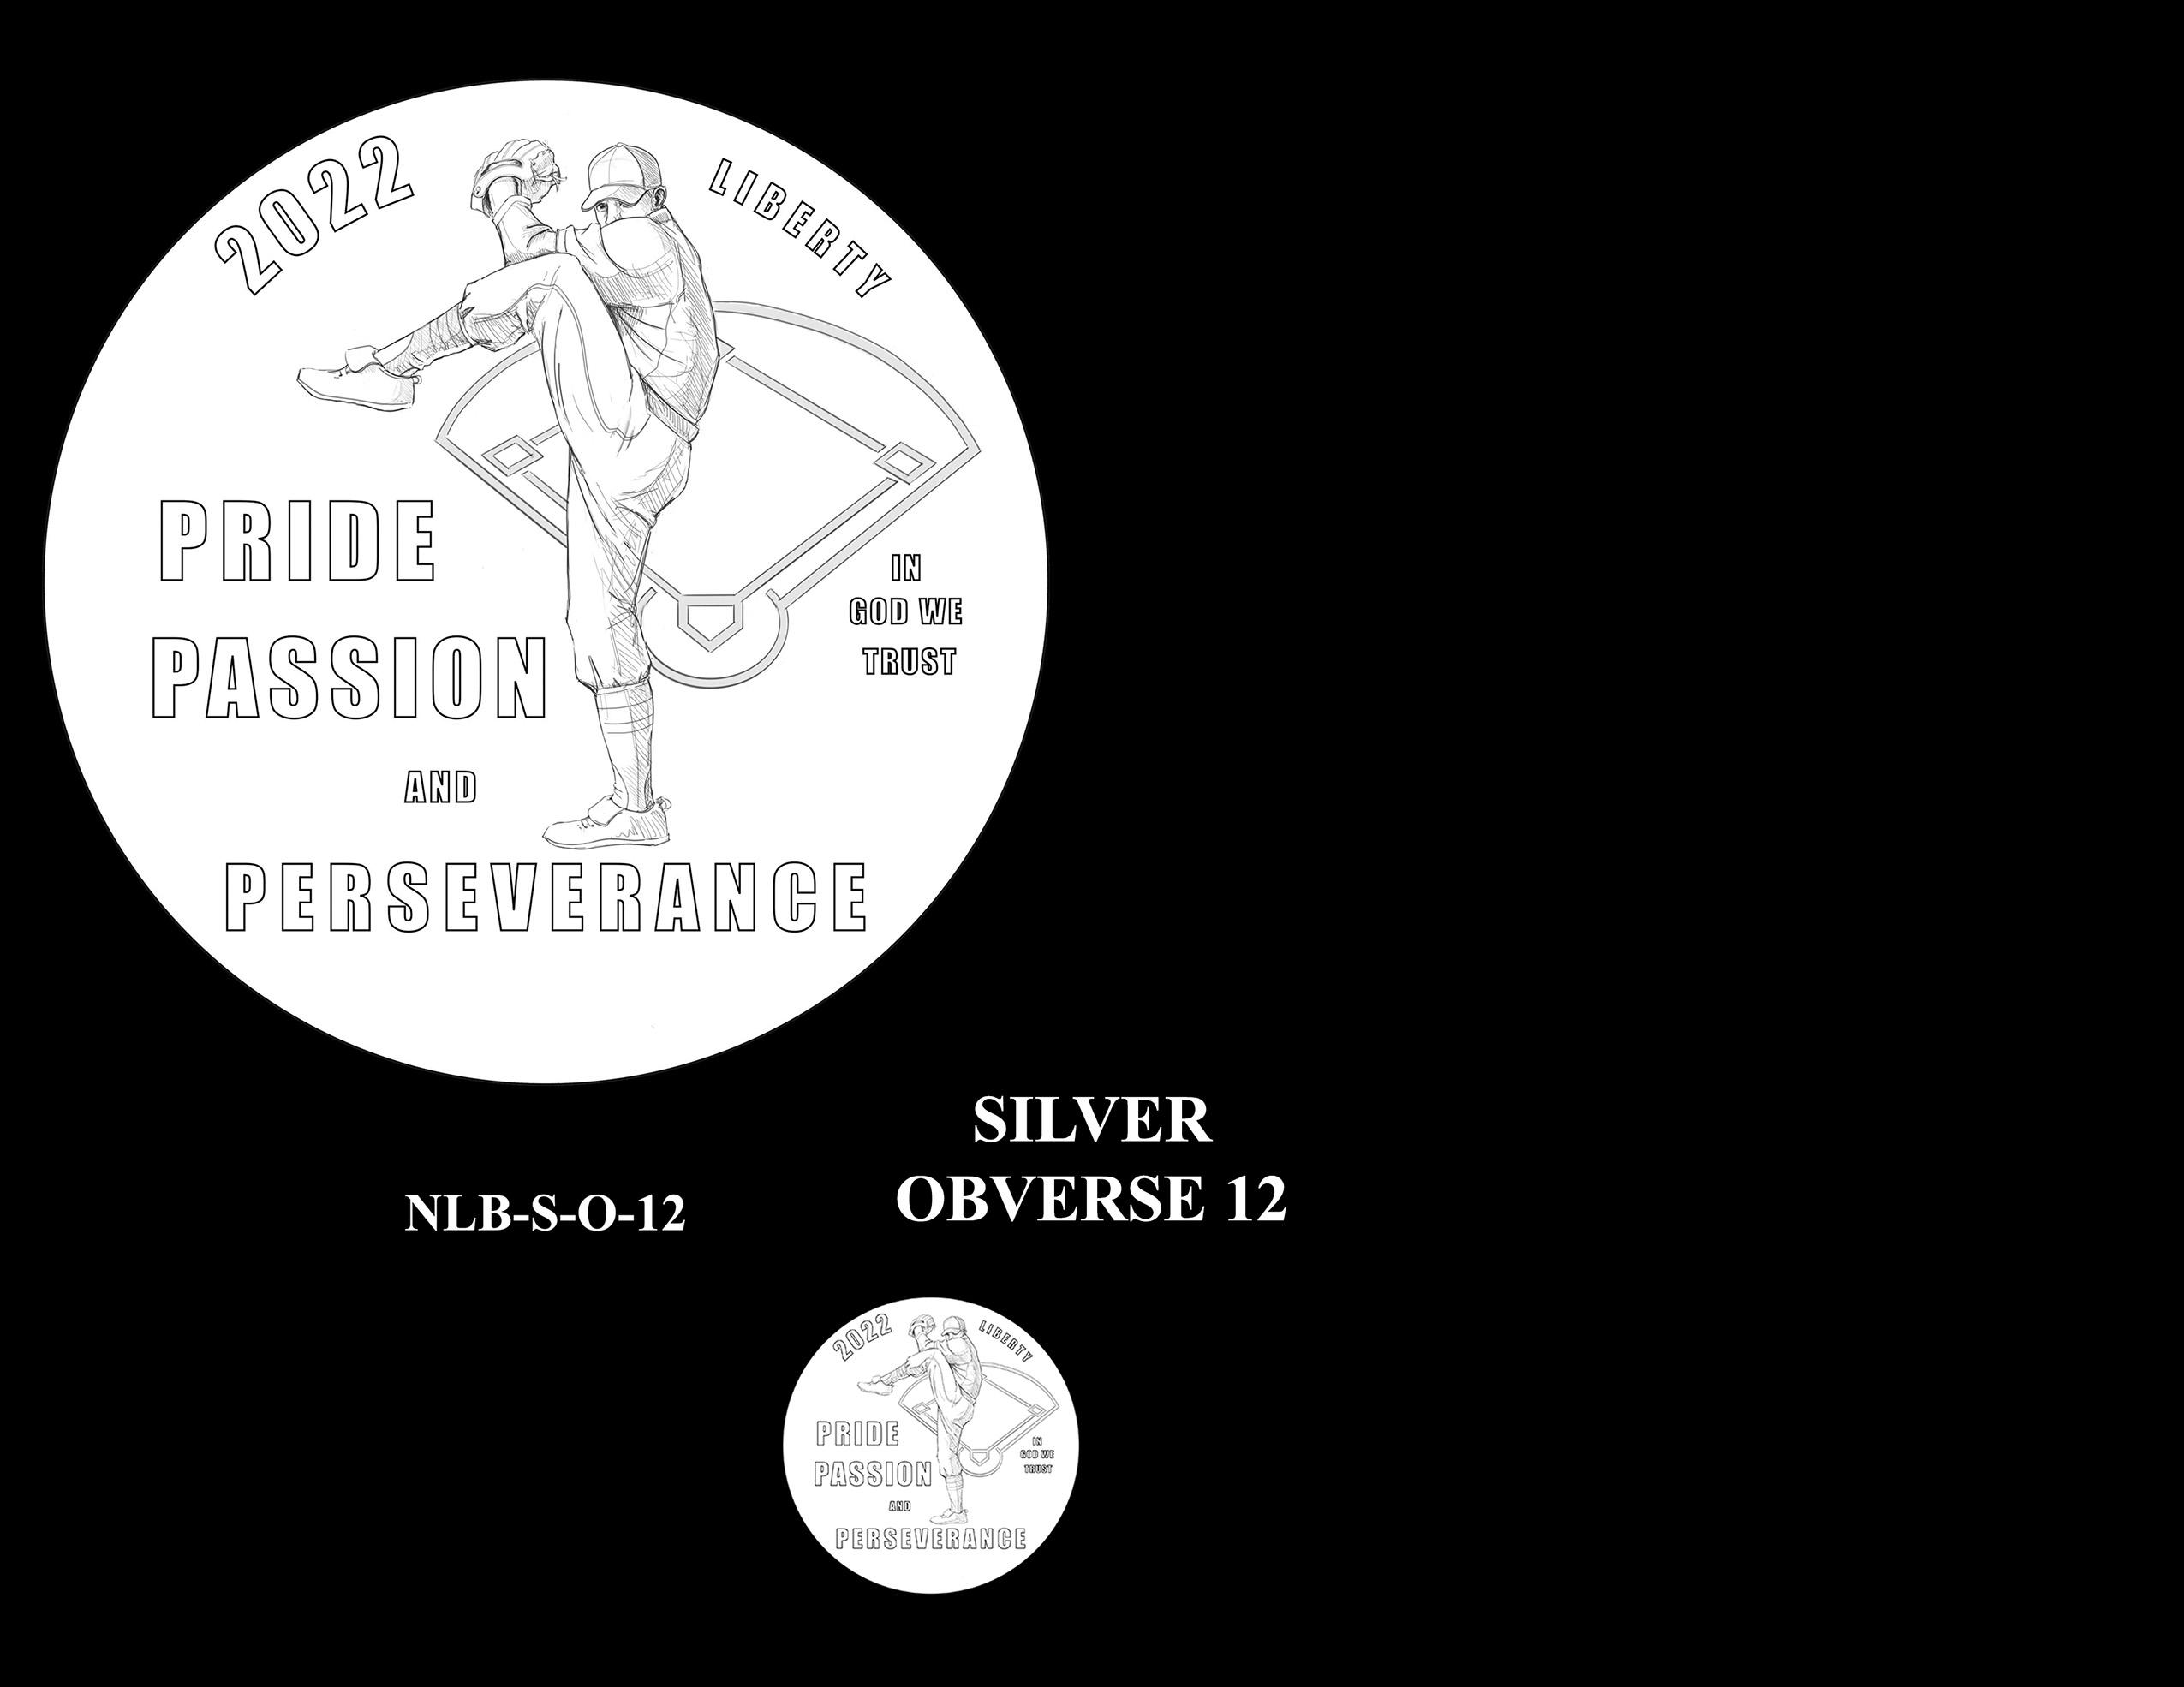 Silver Pair 12 -- Negro Leagues Baseball Commemorative Coin Program